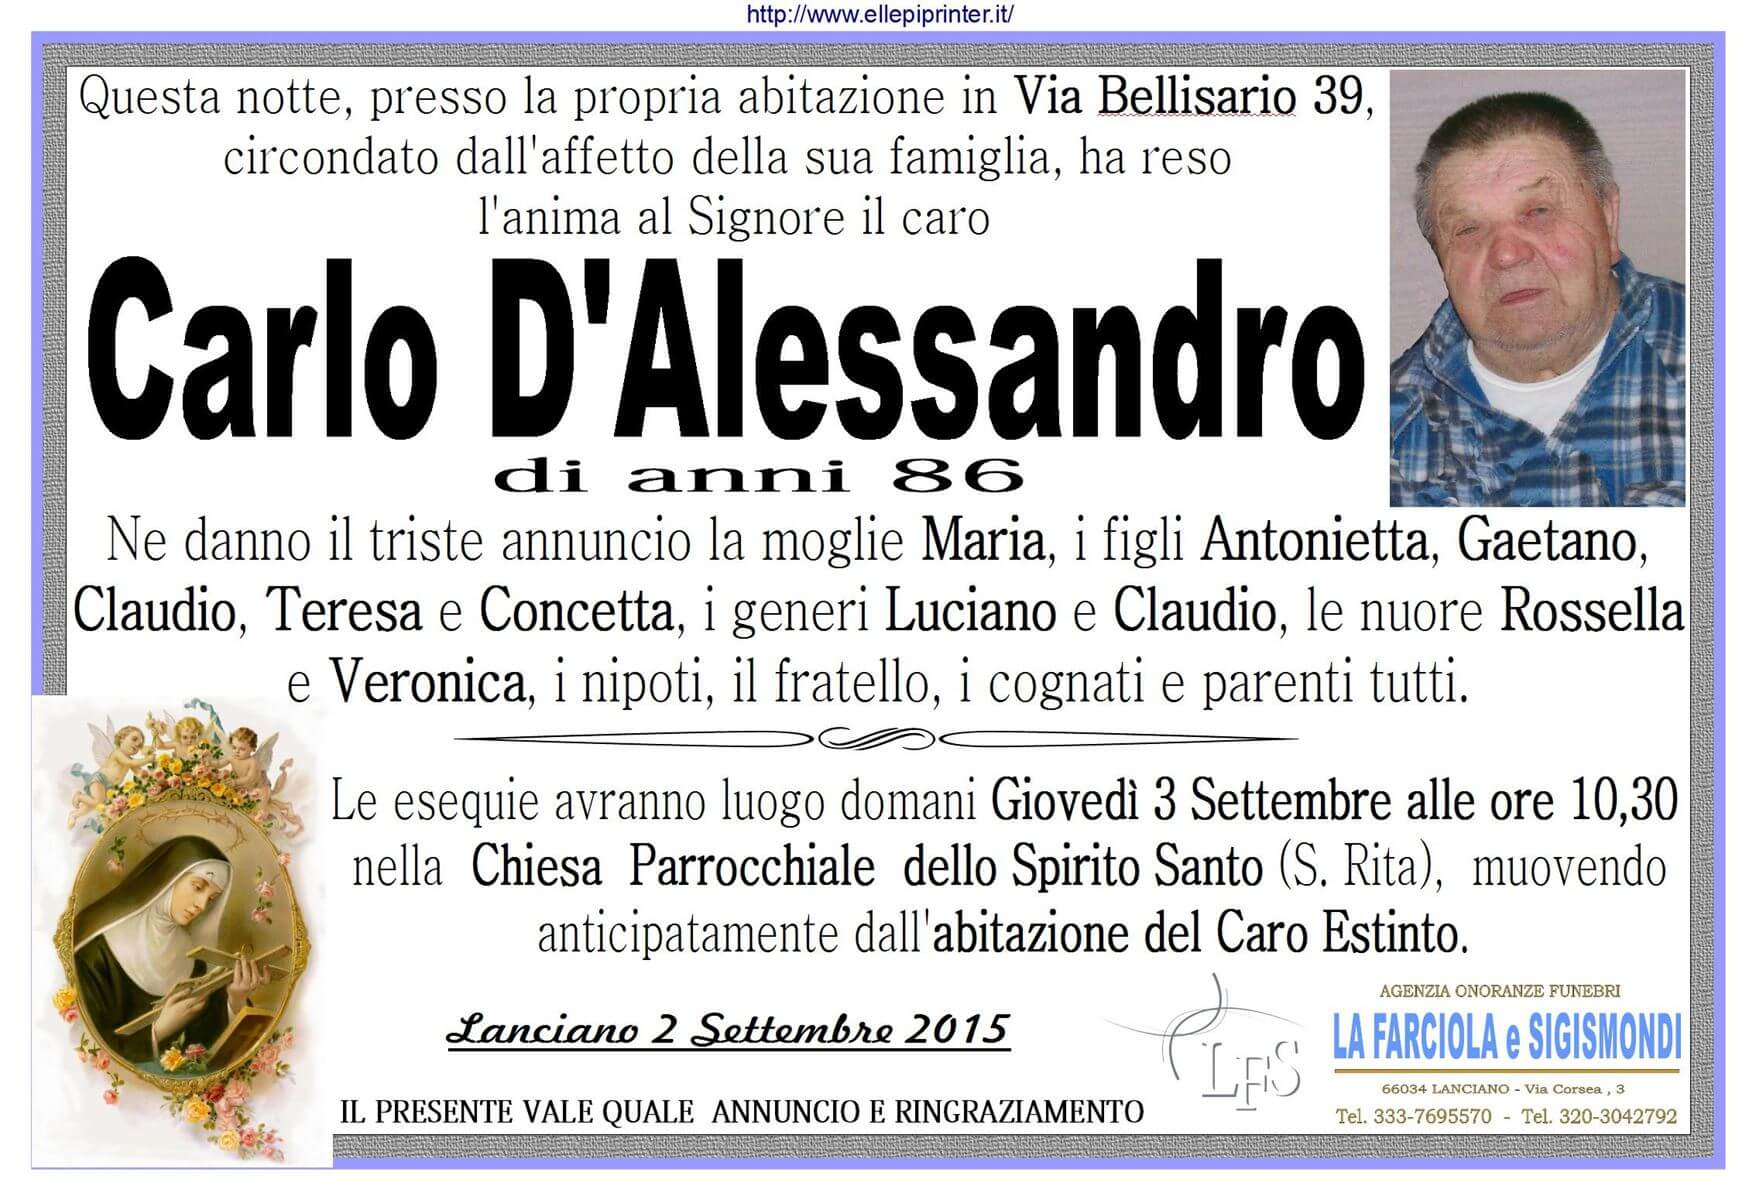 MANIFESTO D'ALESSANDRO CARLO